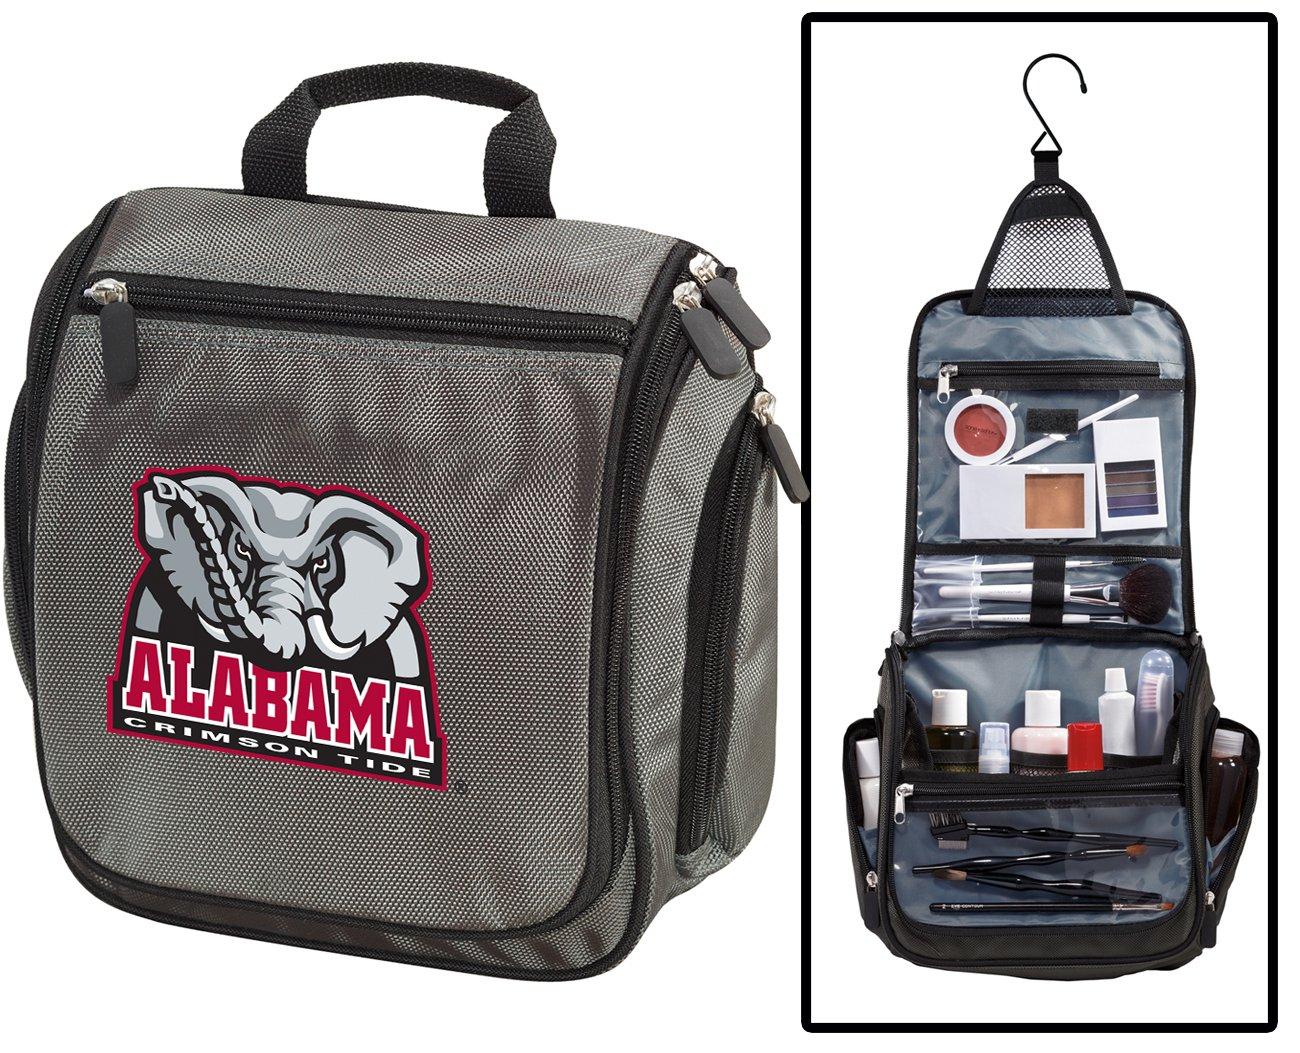 Alabama Toiletry Bags or Mens Shaving Kits HANGABLE Travel Bag